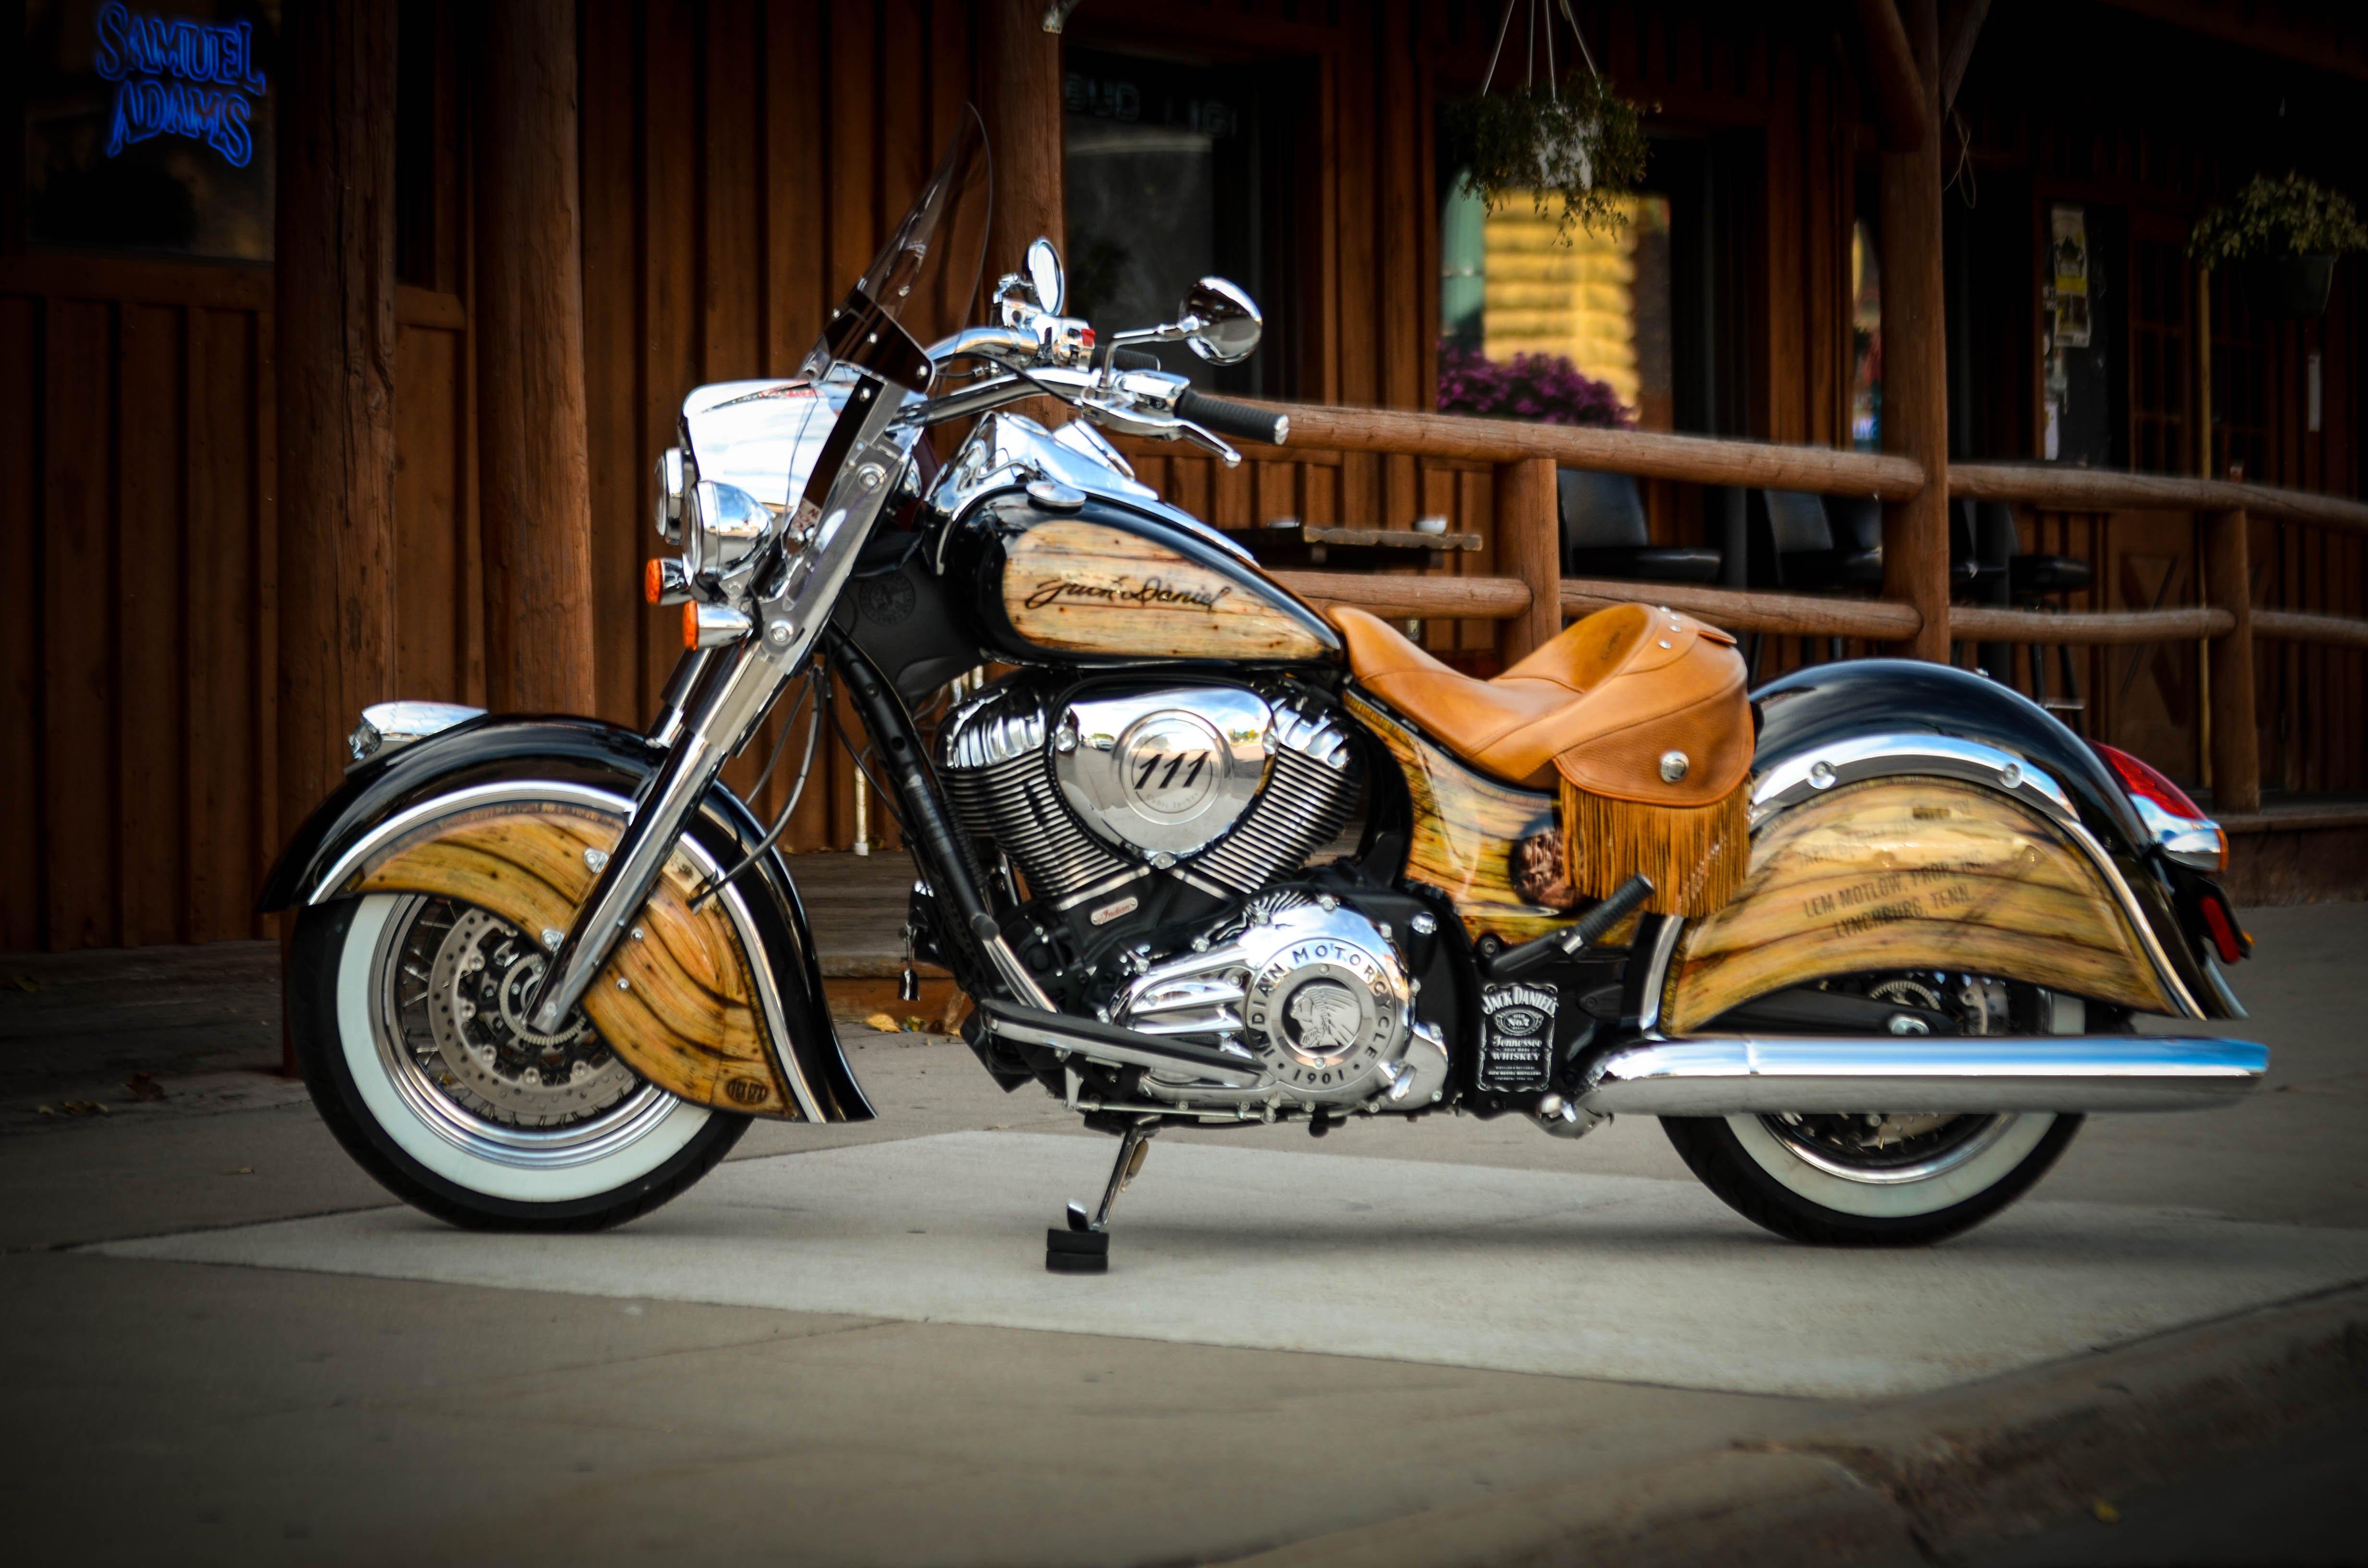 INDIAN motorbike bike motorcycle s wallpaper background 4928x3264